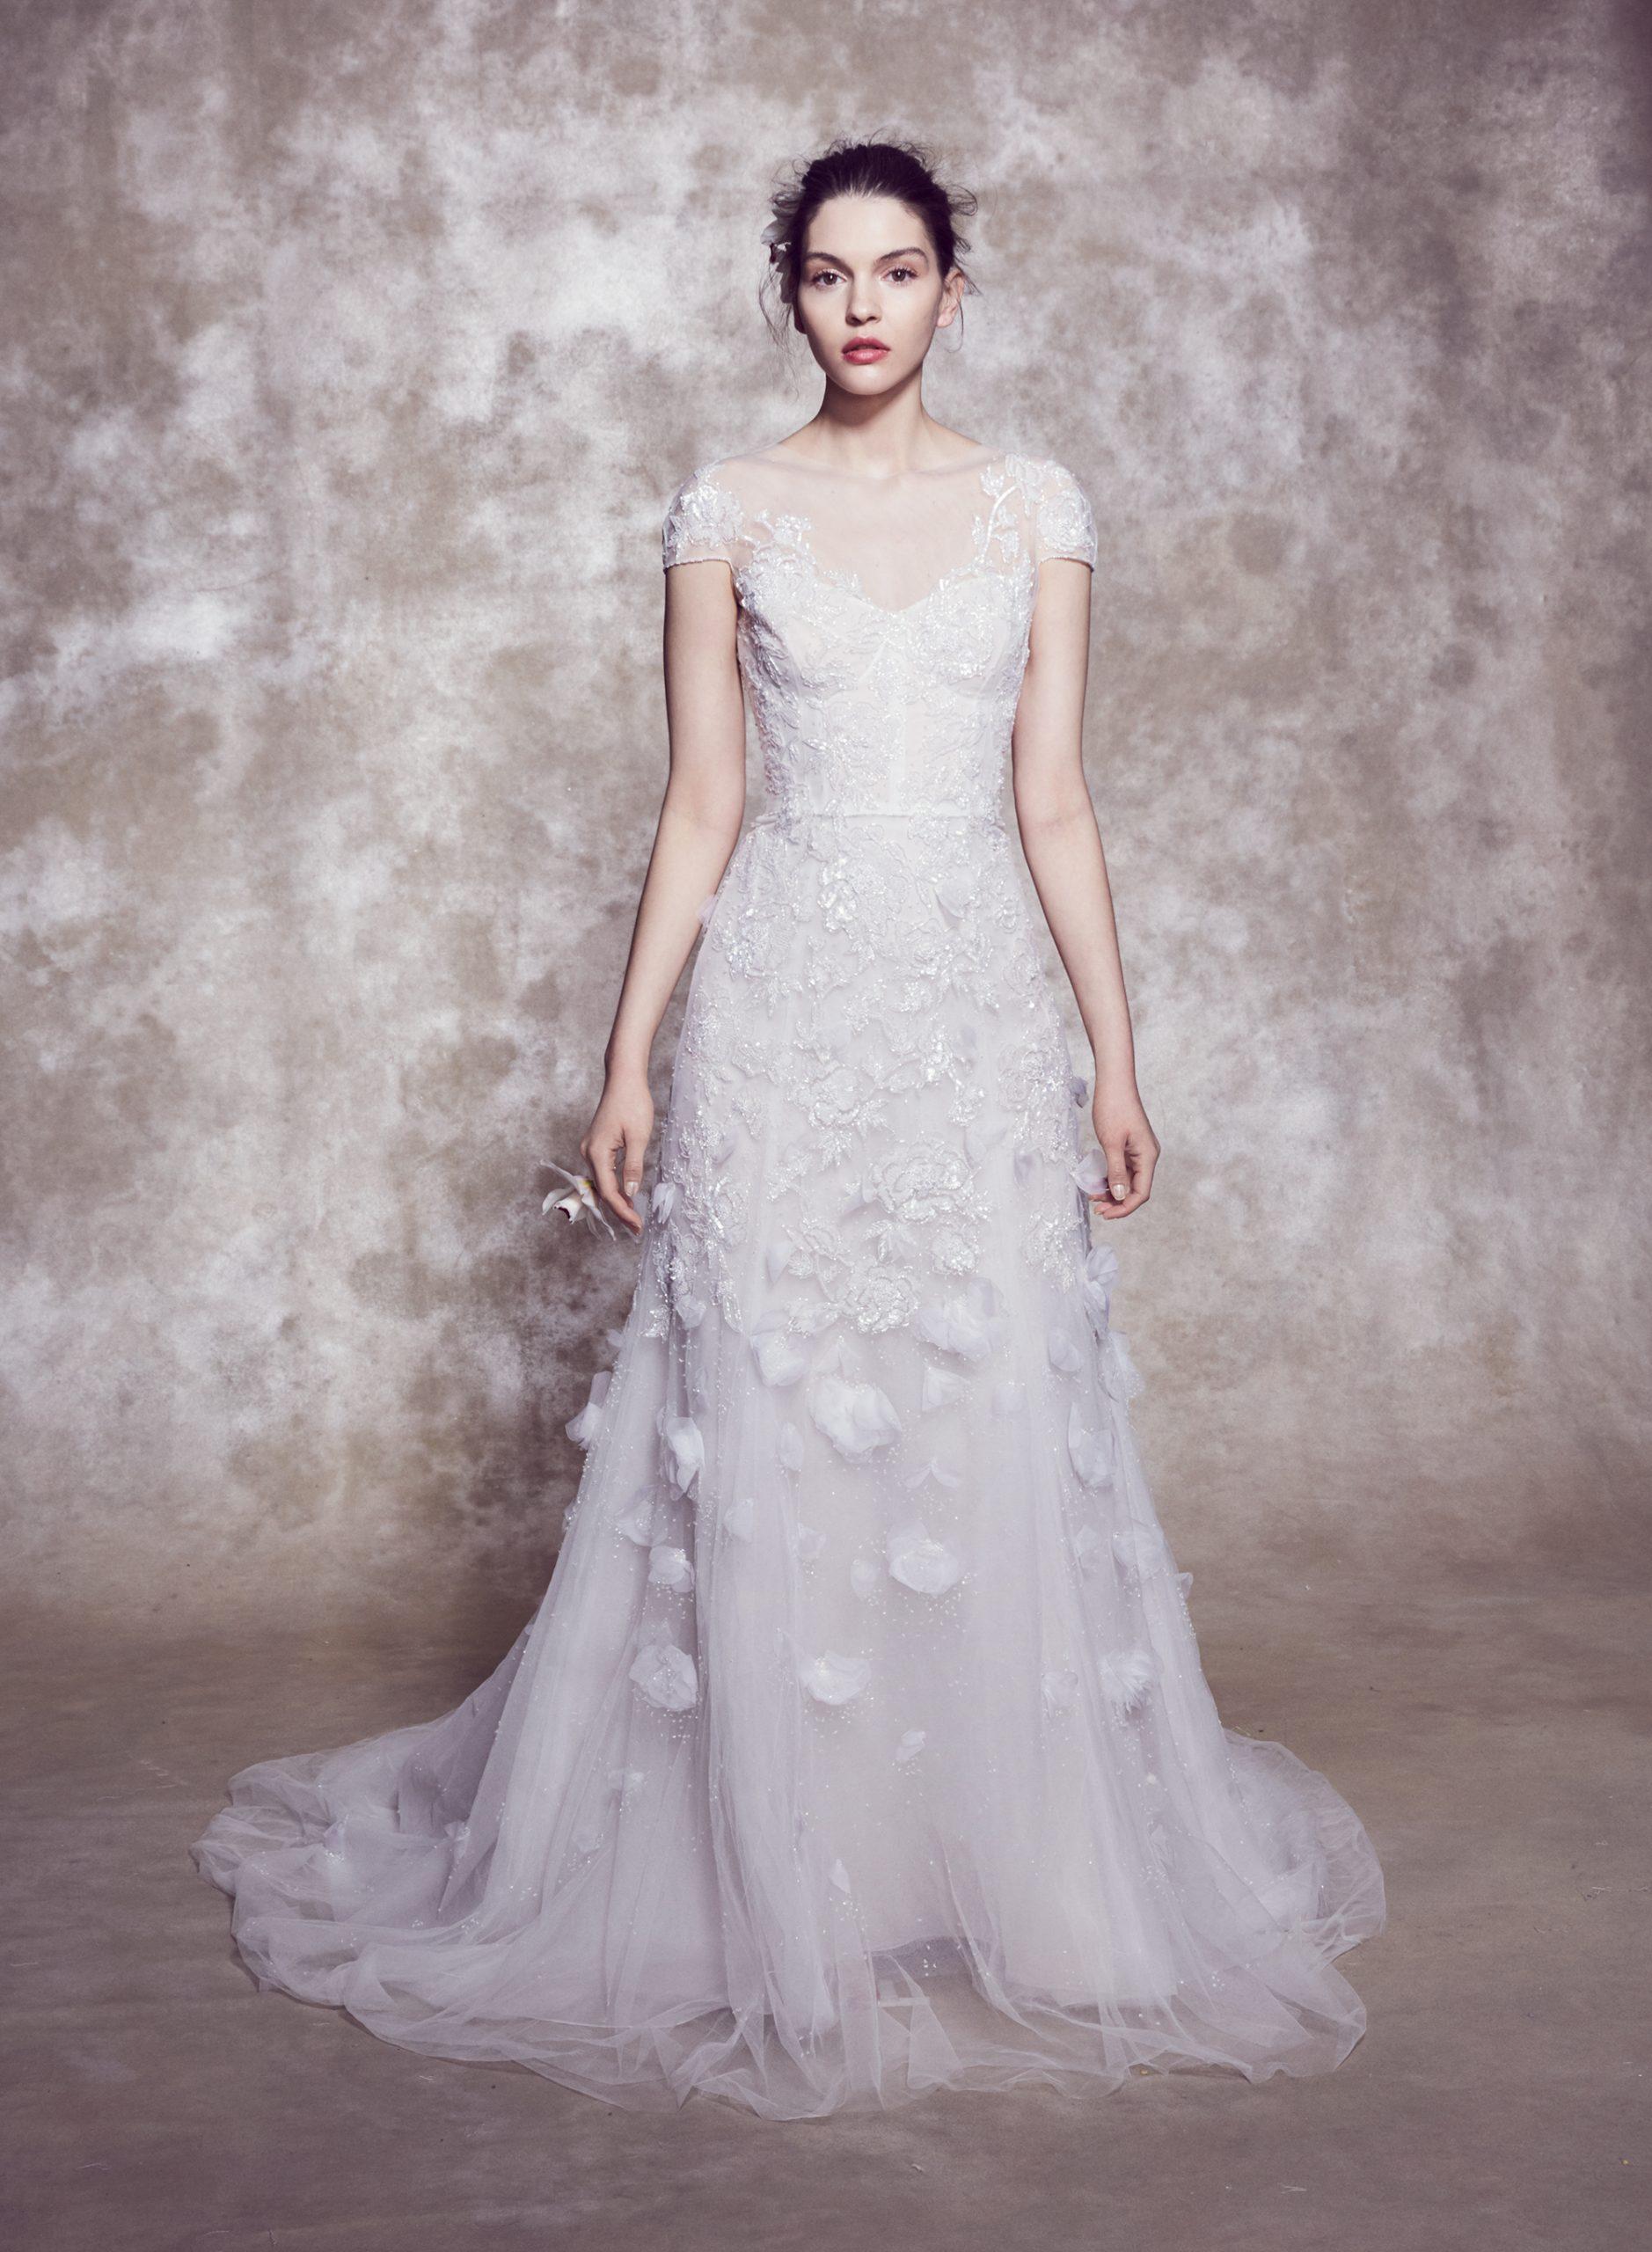 3wkwzh1m7l79xm,Nursing Dresses For Wedding Guest